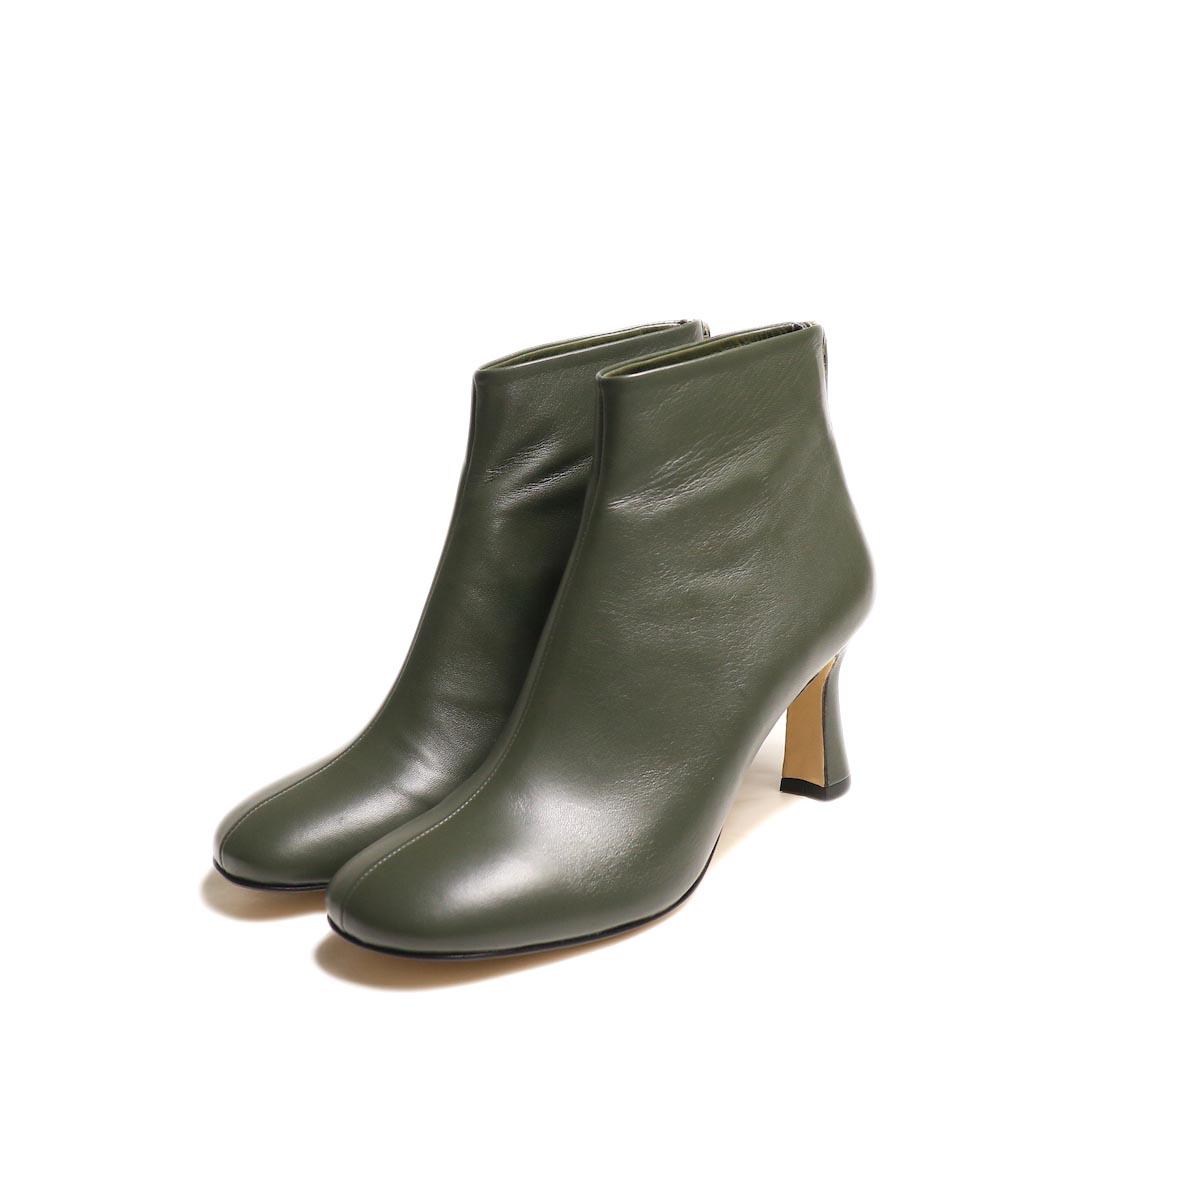 JANE SMITH / SHORT BOOTS -Khaki